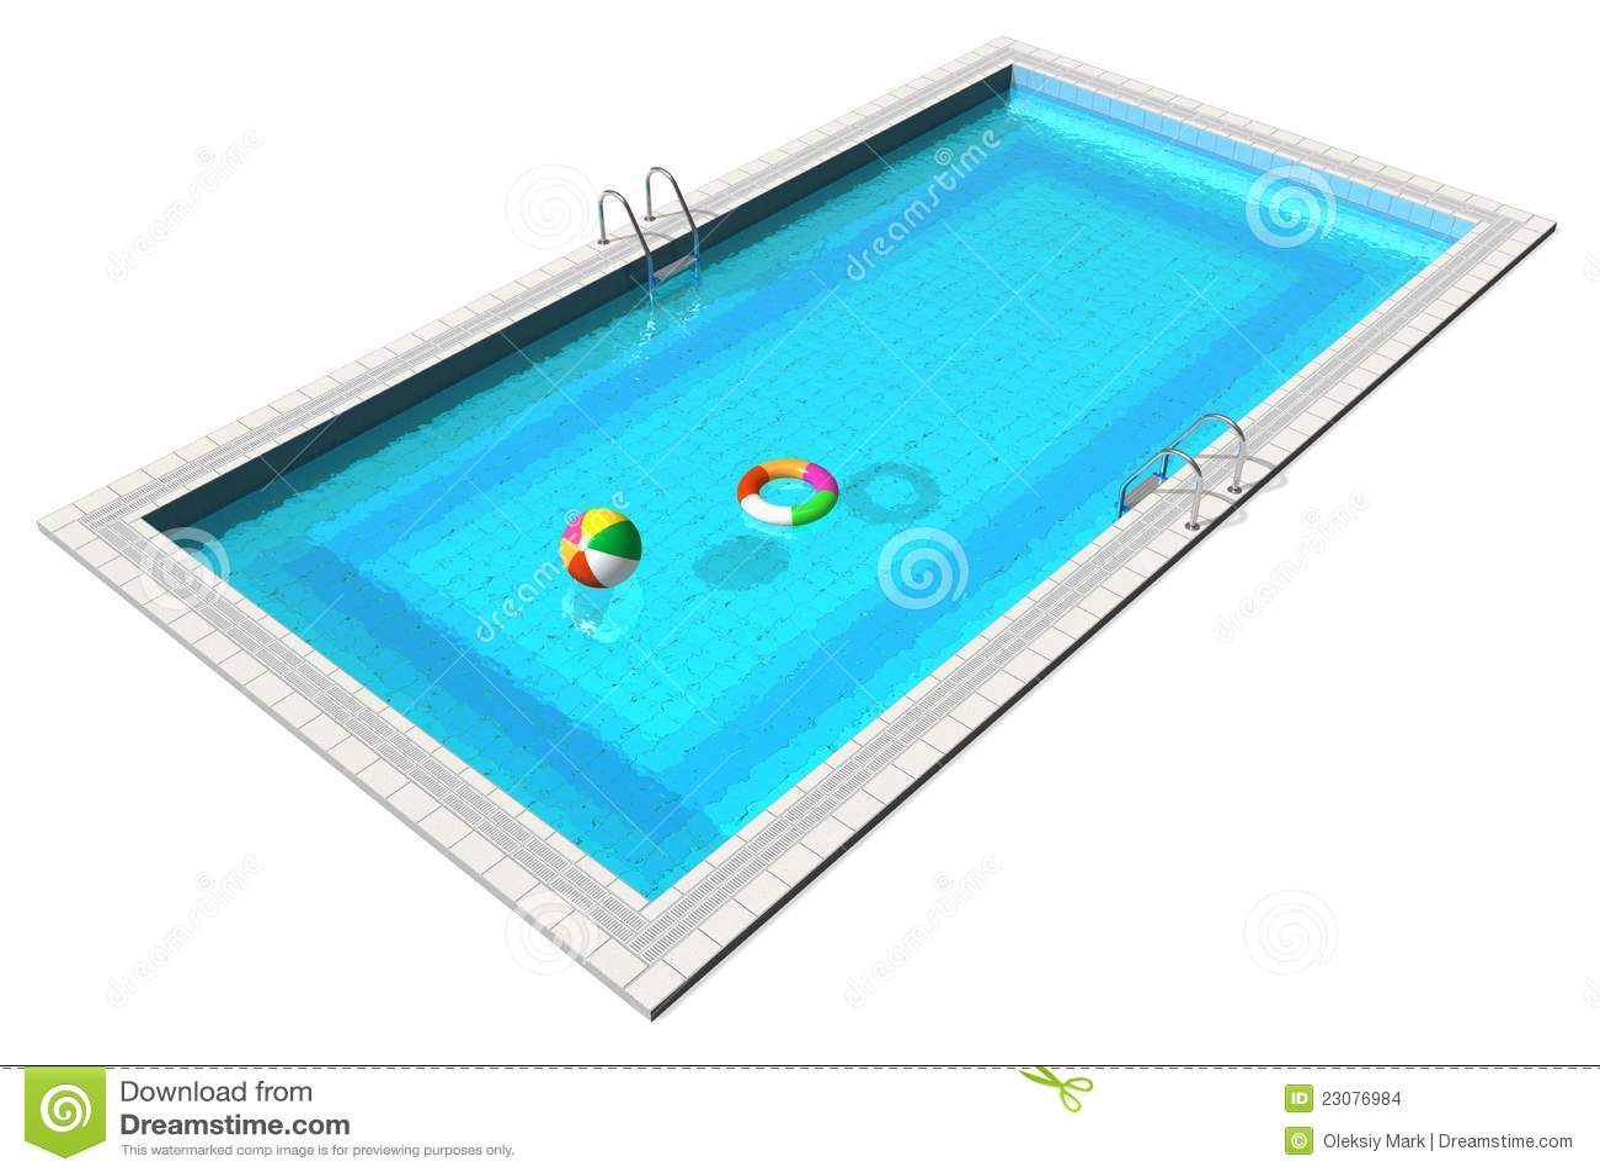 pool toys clip art